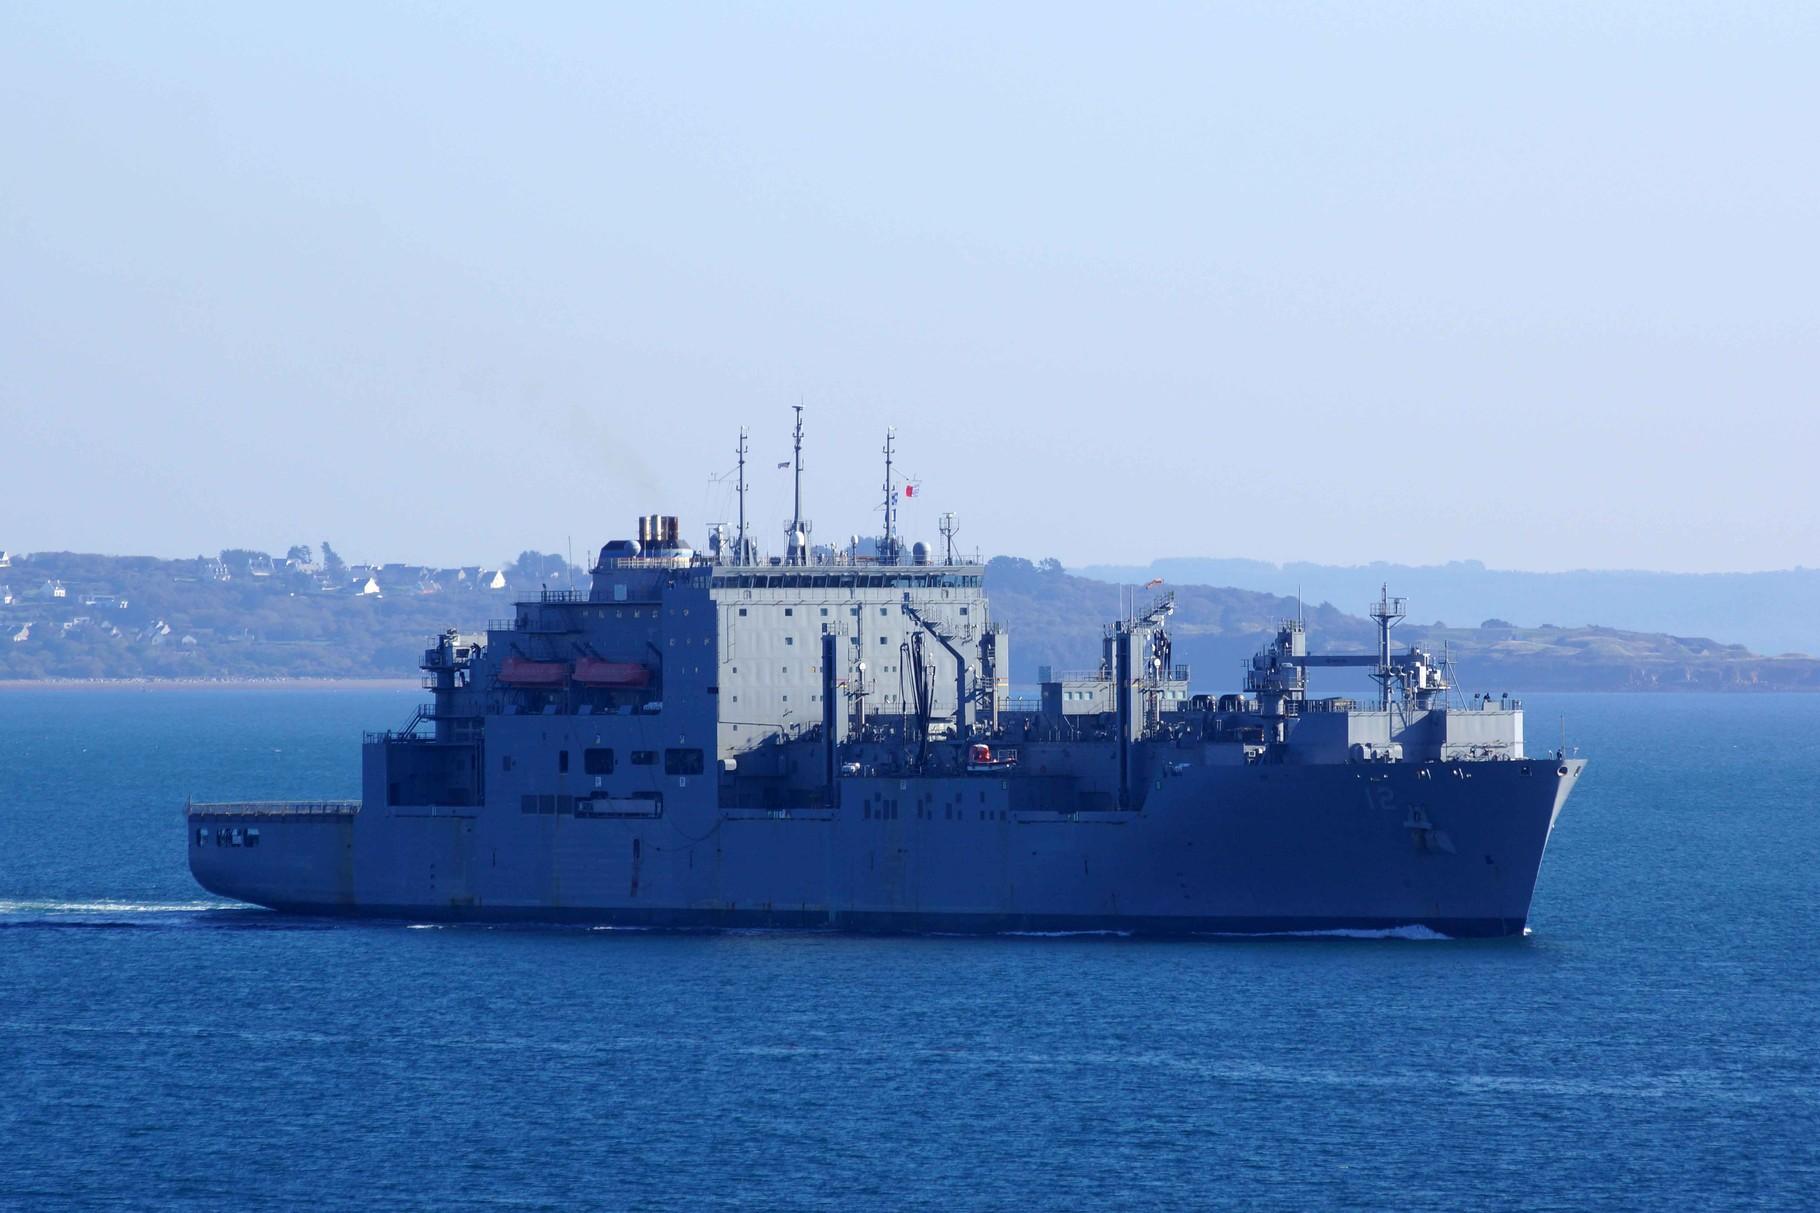 USS Maclean à Brest